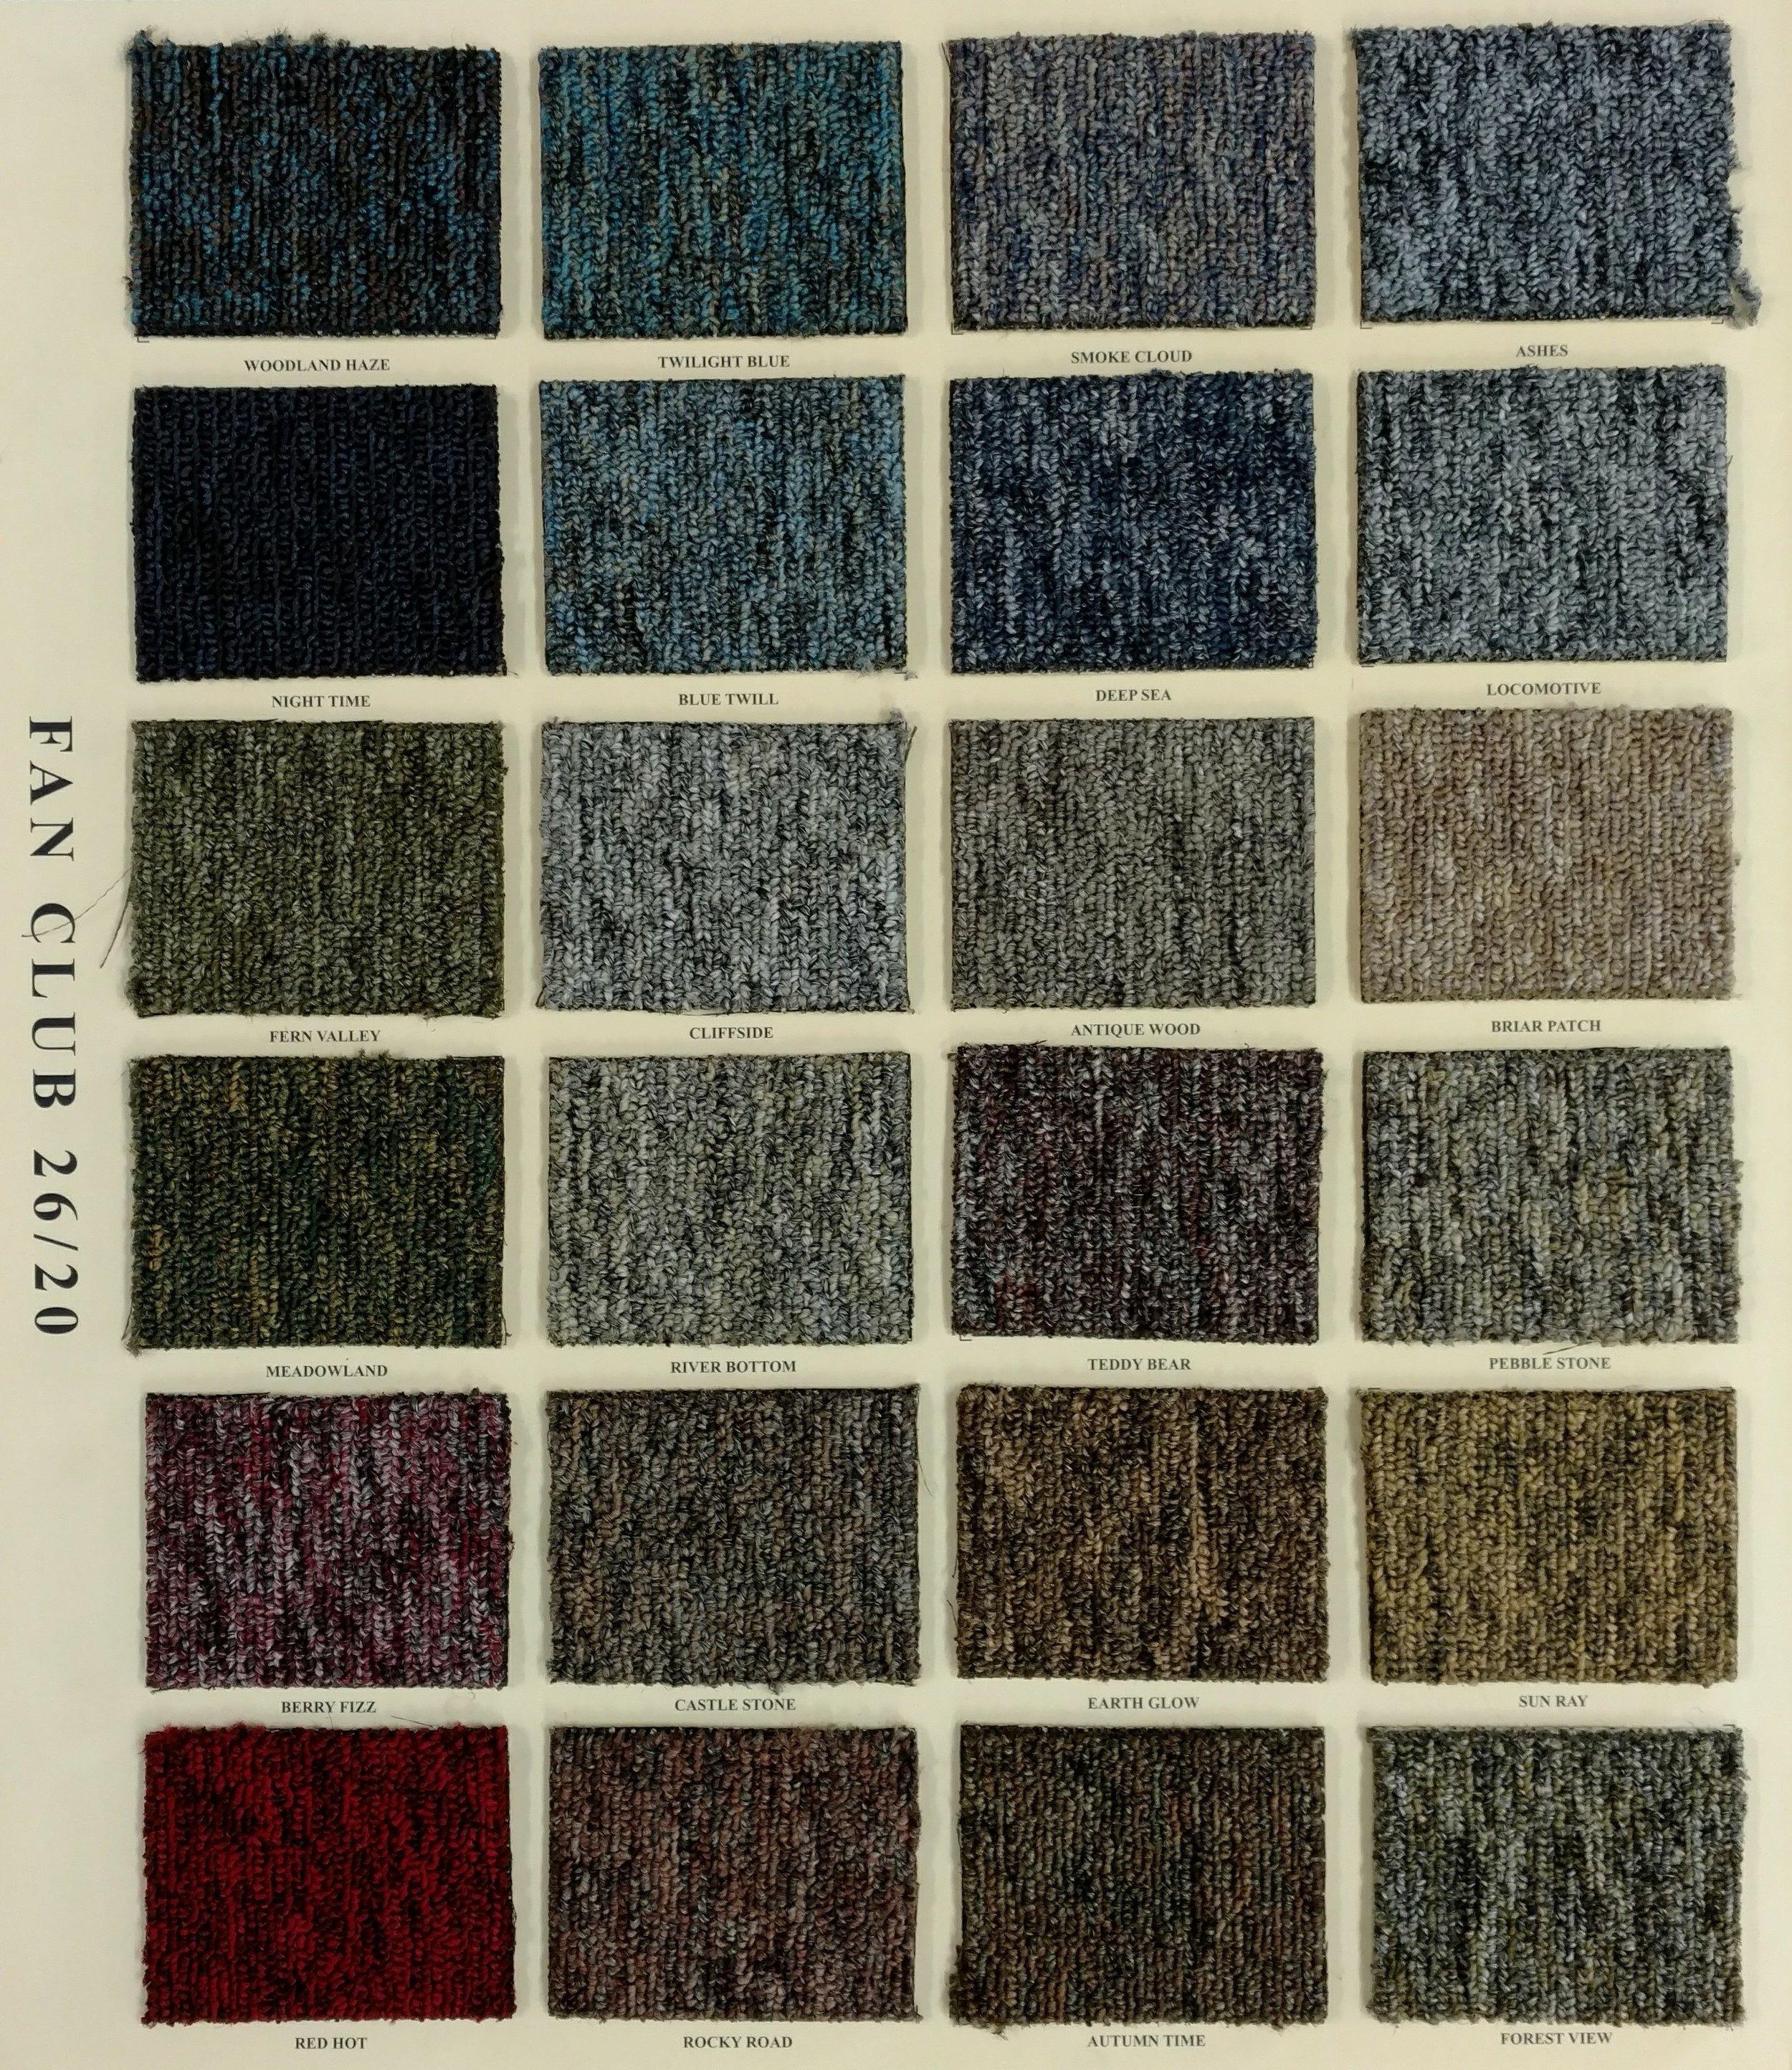 Gibraltar Commerical Carpet - Fan Club Colors.jpg